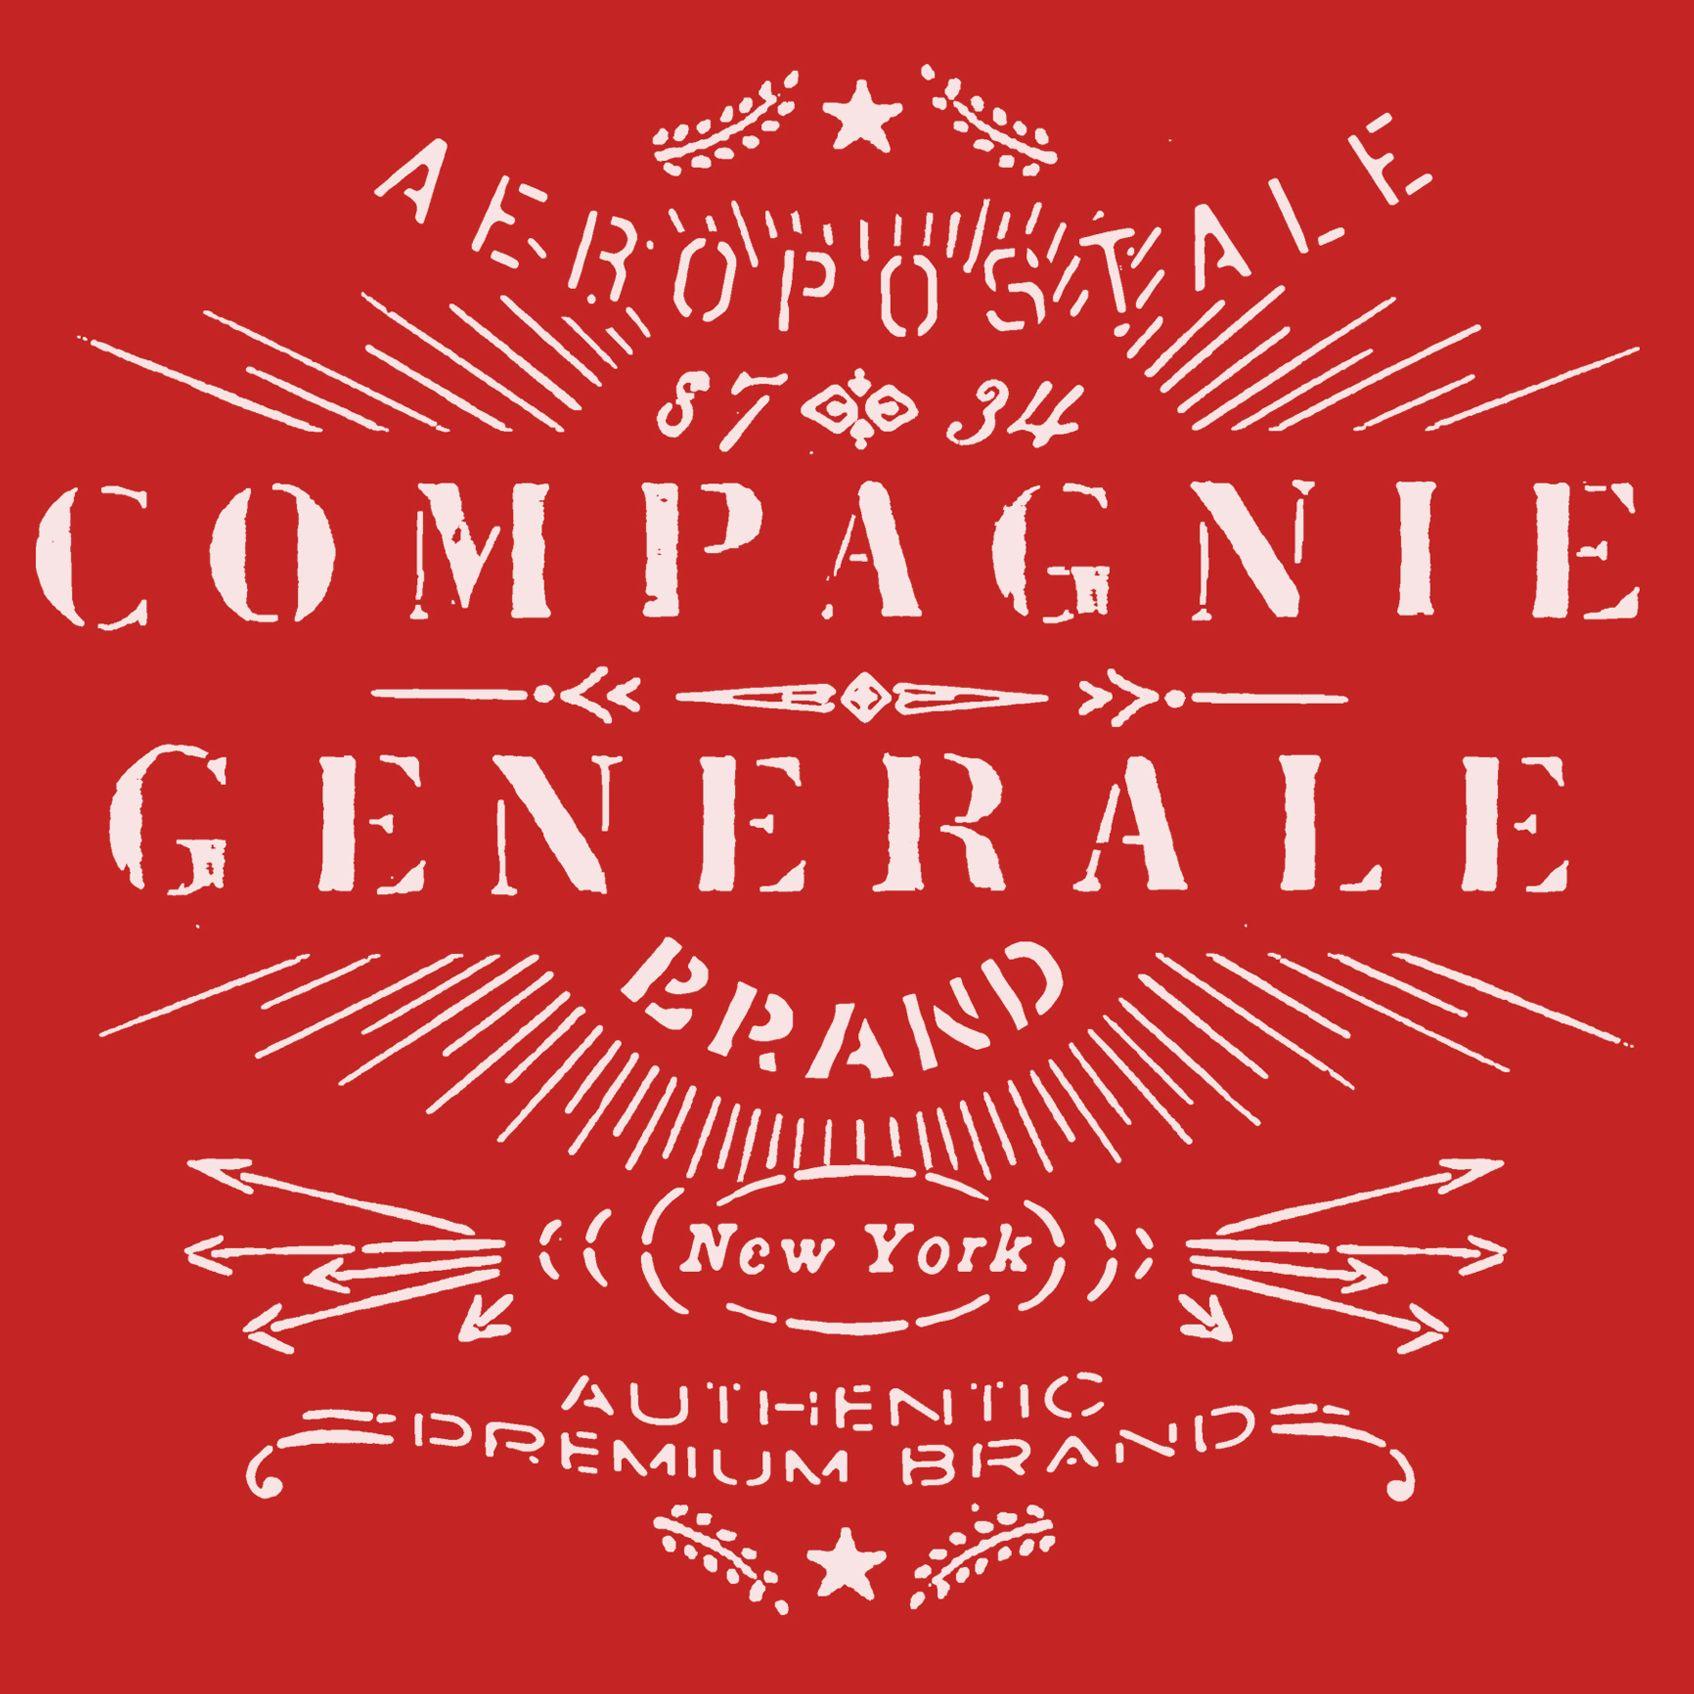 T-shirt design zeixs - Frank Ozmun Graphic Design Branding